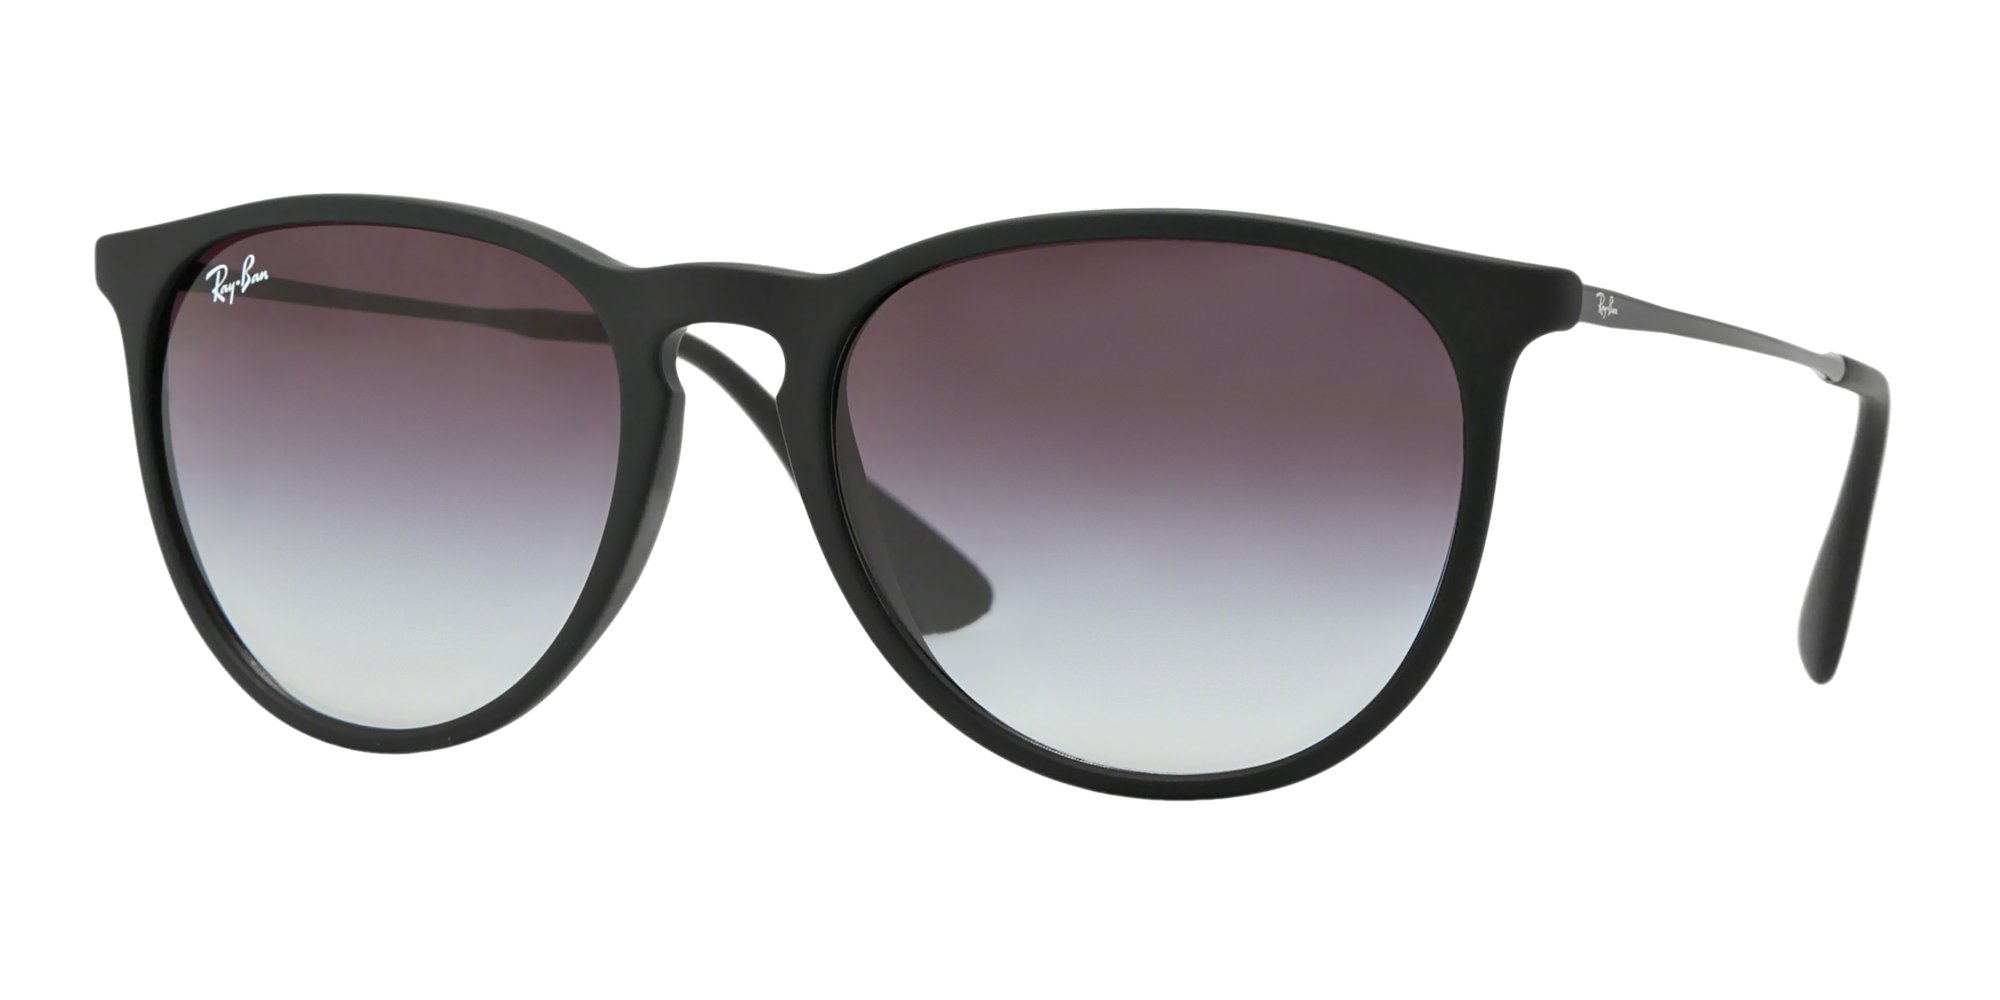 Ray Ban RB4171 622/8G 54M Rubber Black/Light Grey Gradient Dark Grey+FREE Complimentary Eyewear Care Kit